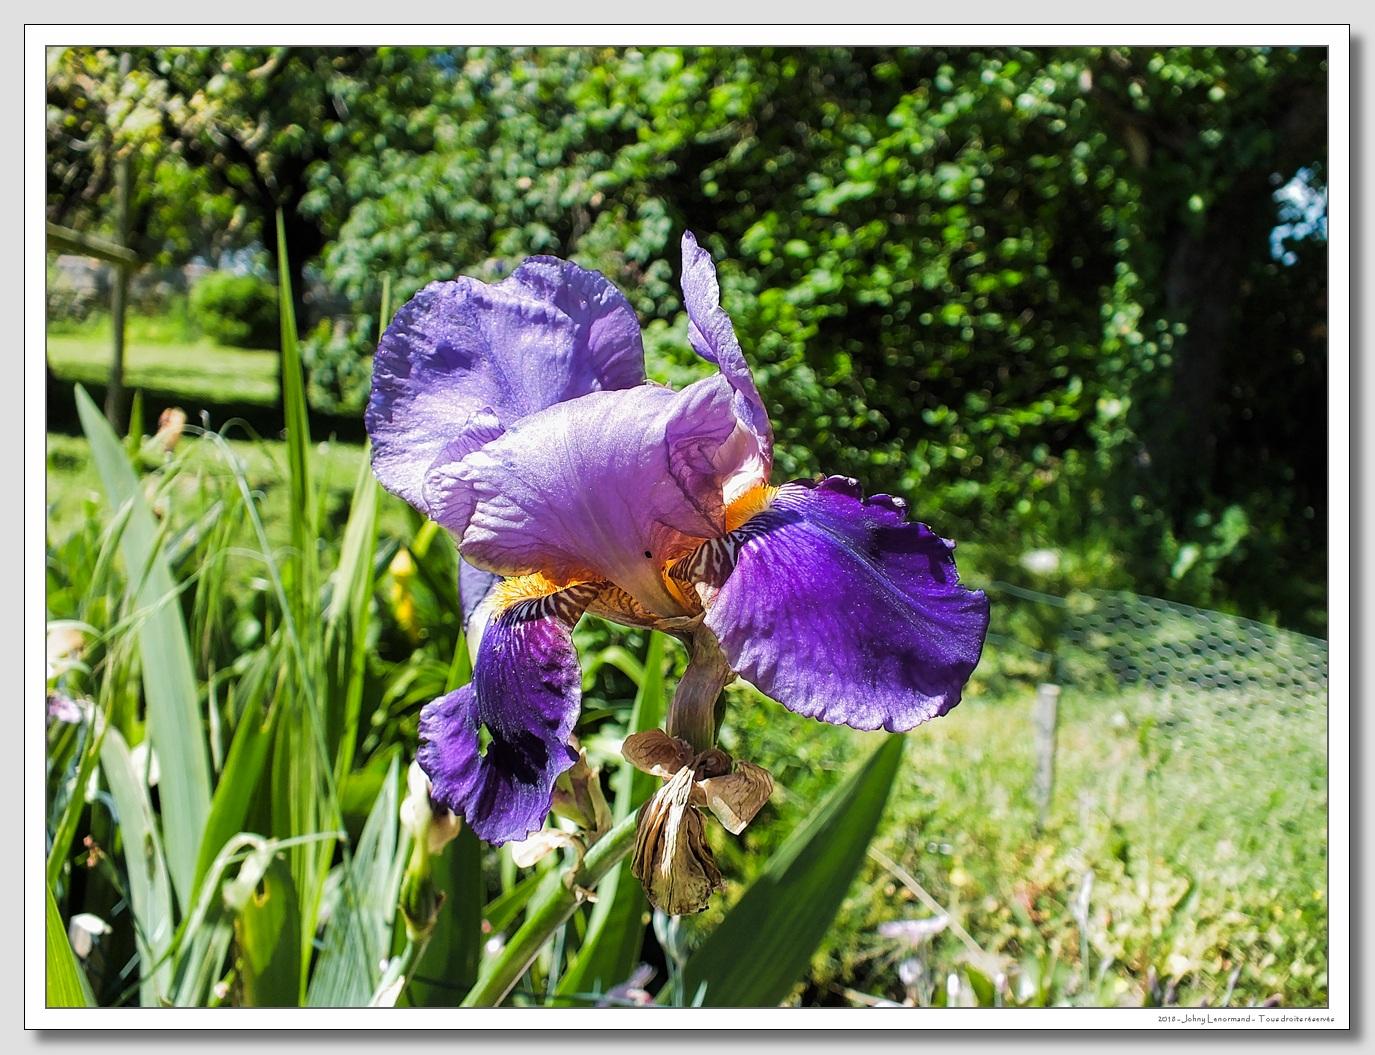 Dans le jardin au mois de mai